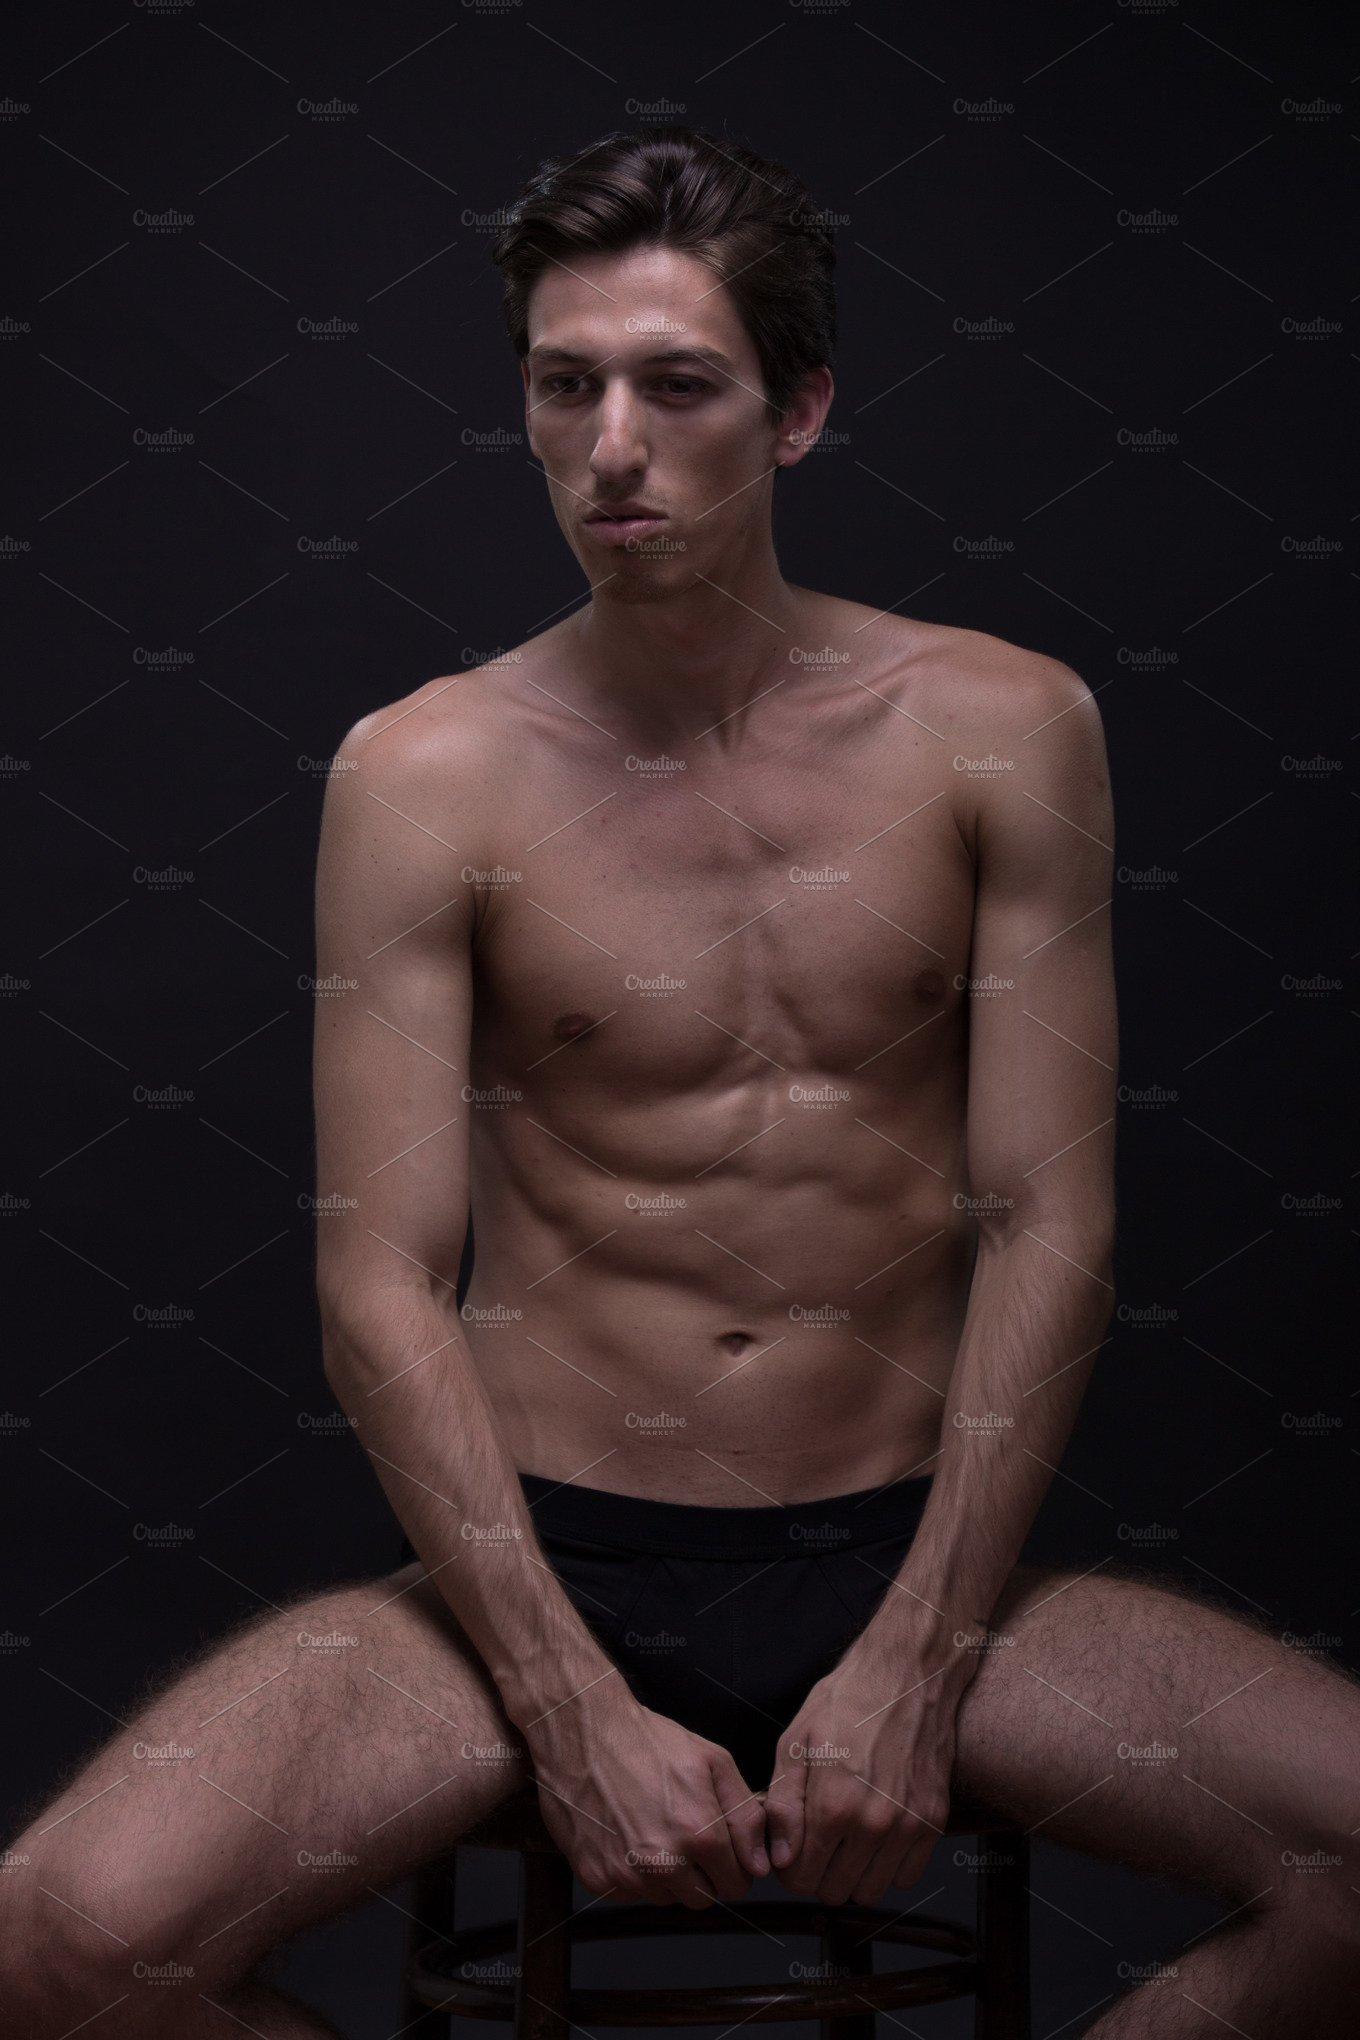 steveolasvegas2013 Male Photographer Profile - Las Vegas